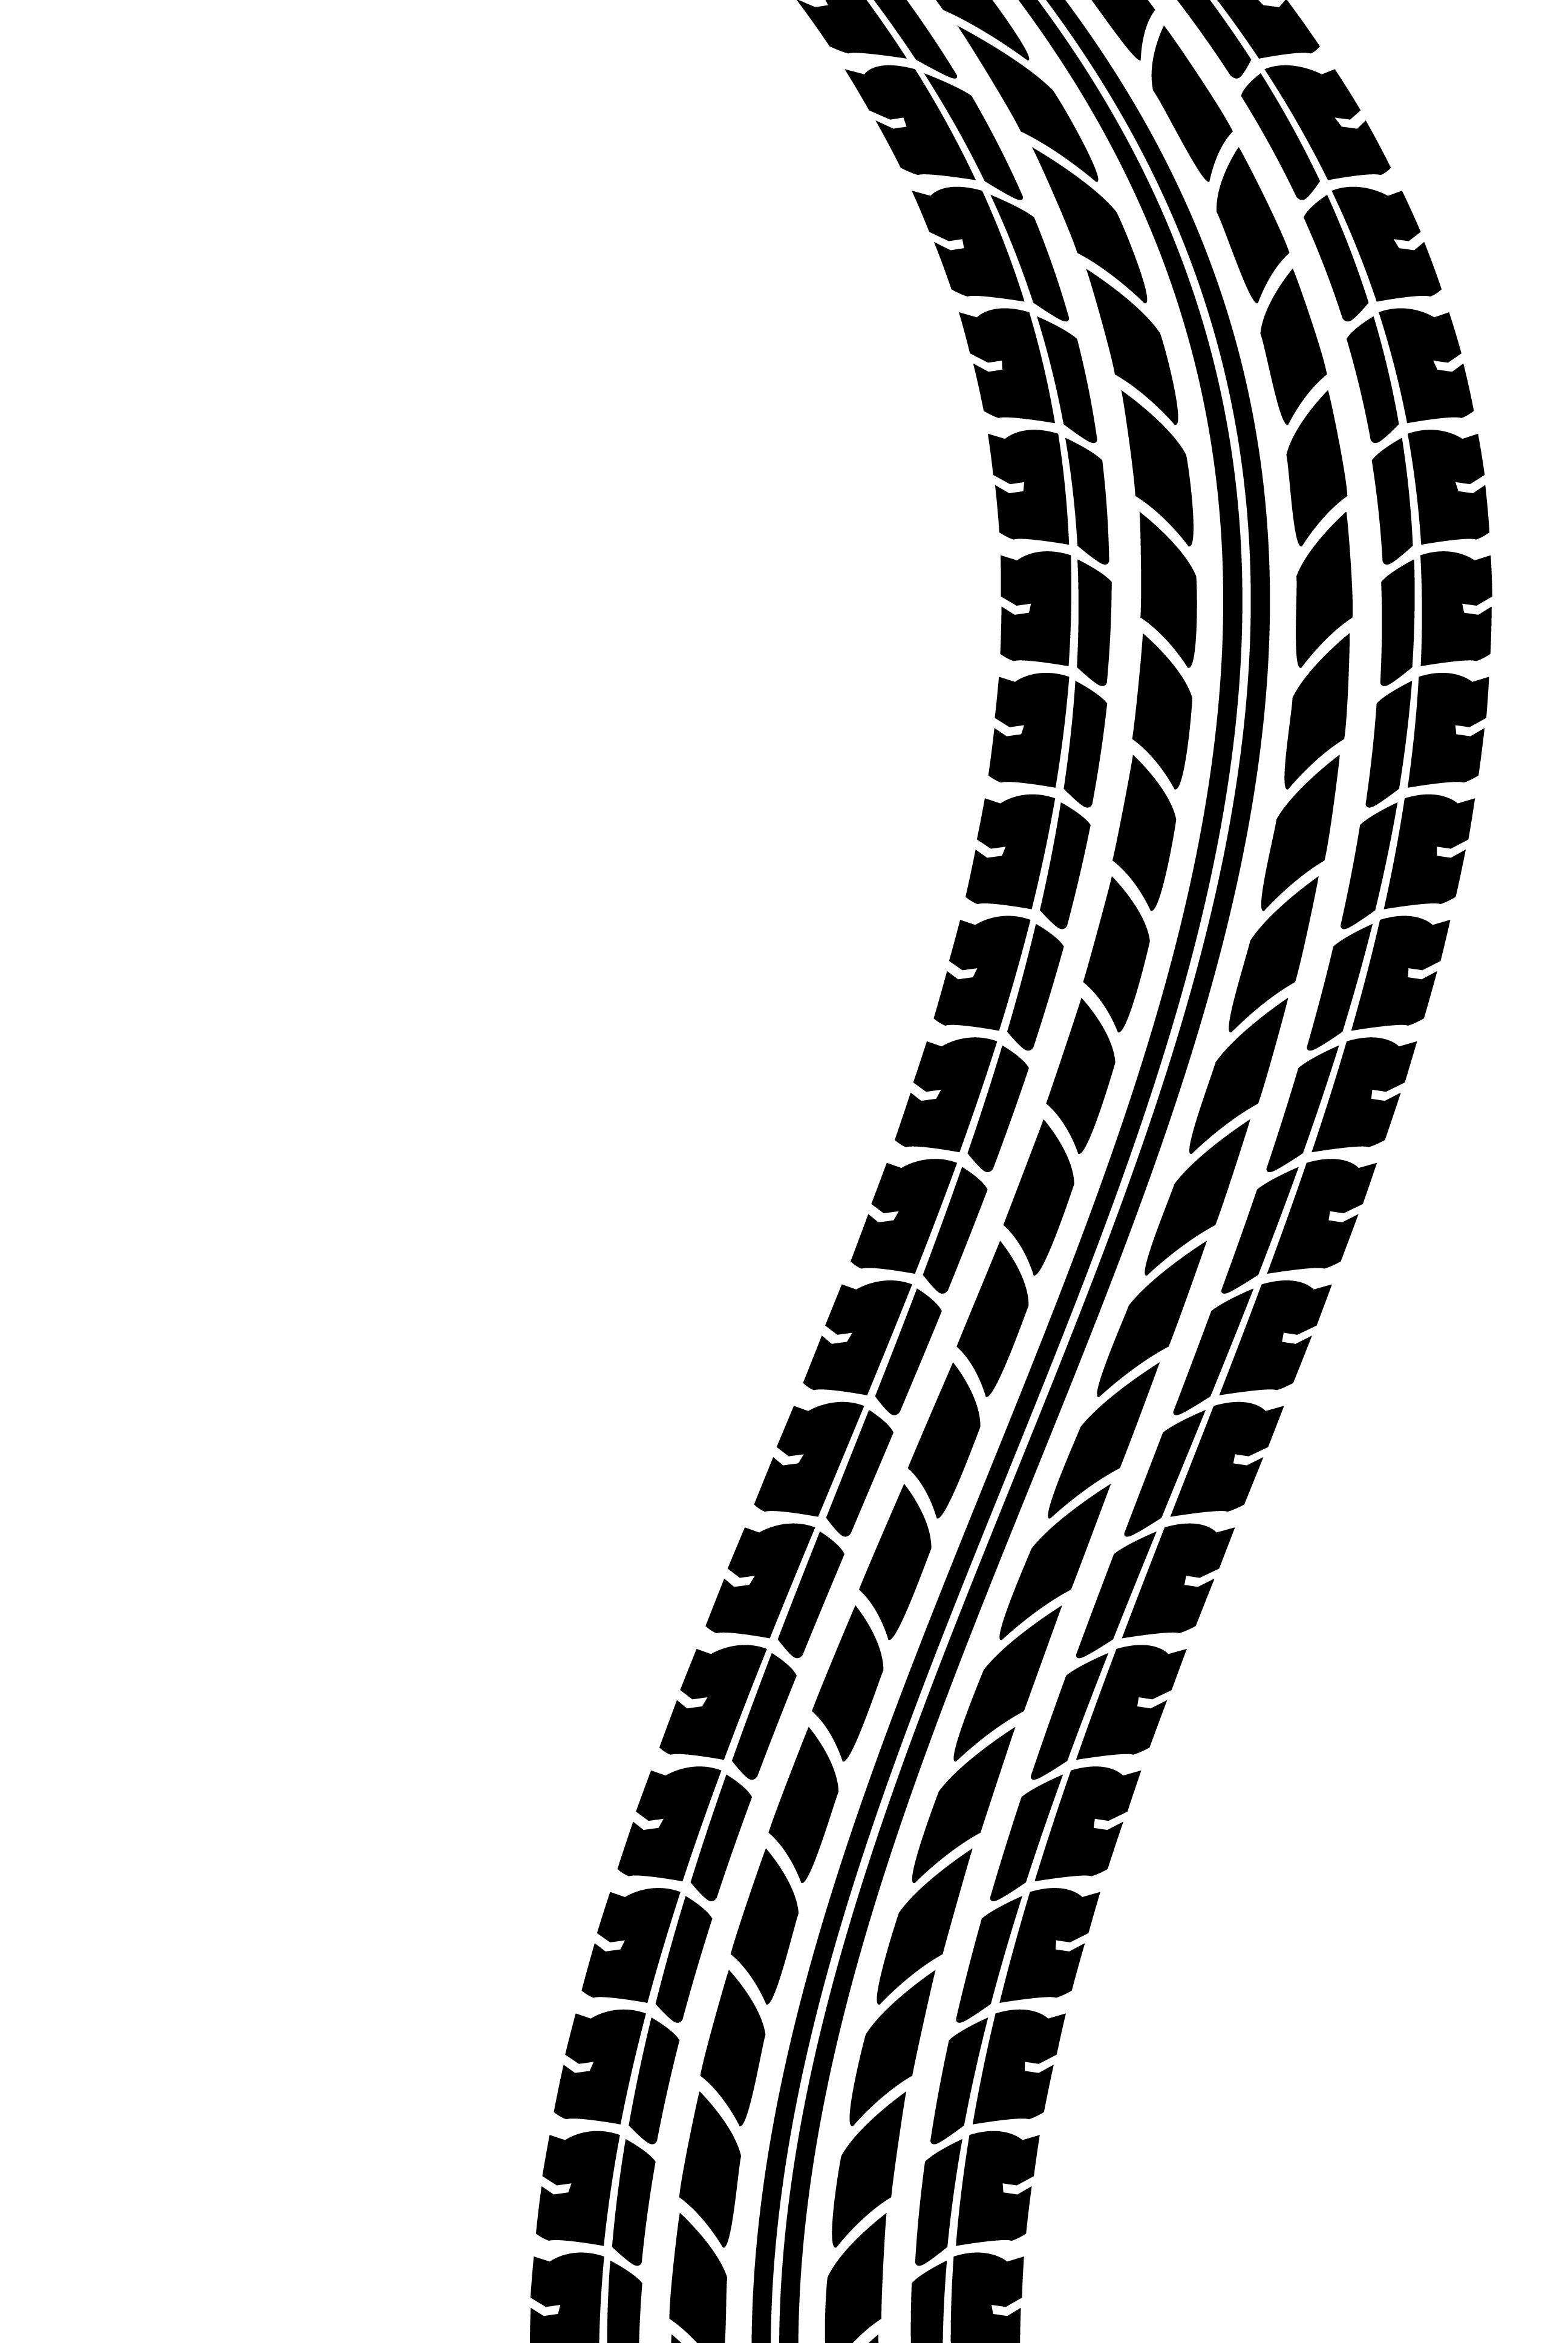 Pin By Yulya Pleskach On Office Tire Tracks Tyre Tracks Clip Art